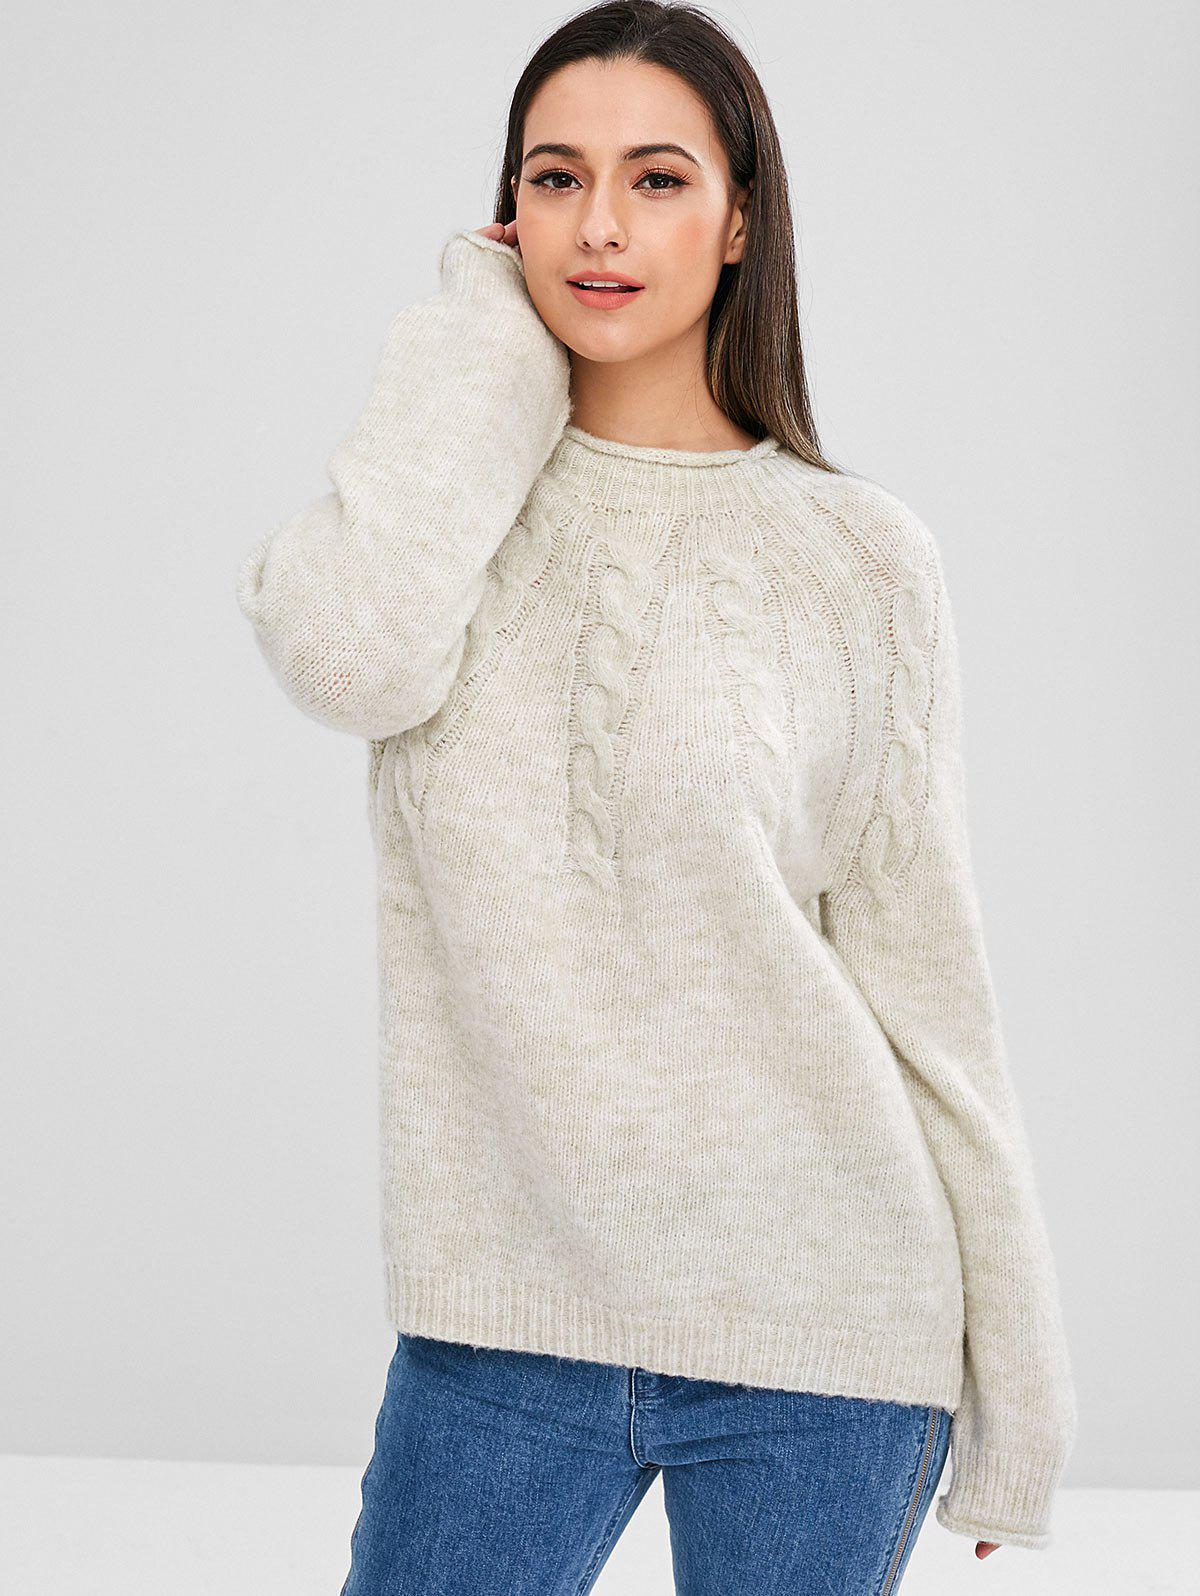 ZAFUL Raglan Sleeve Cable Knit Sweater